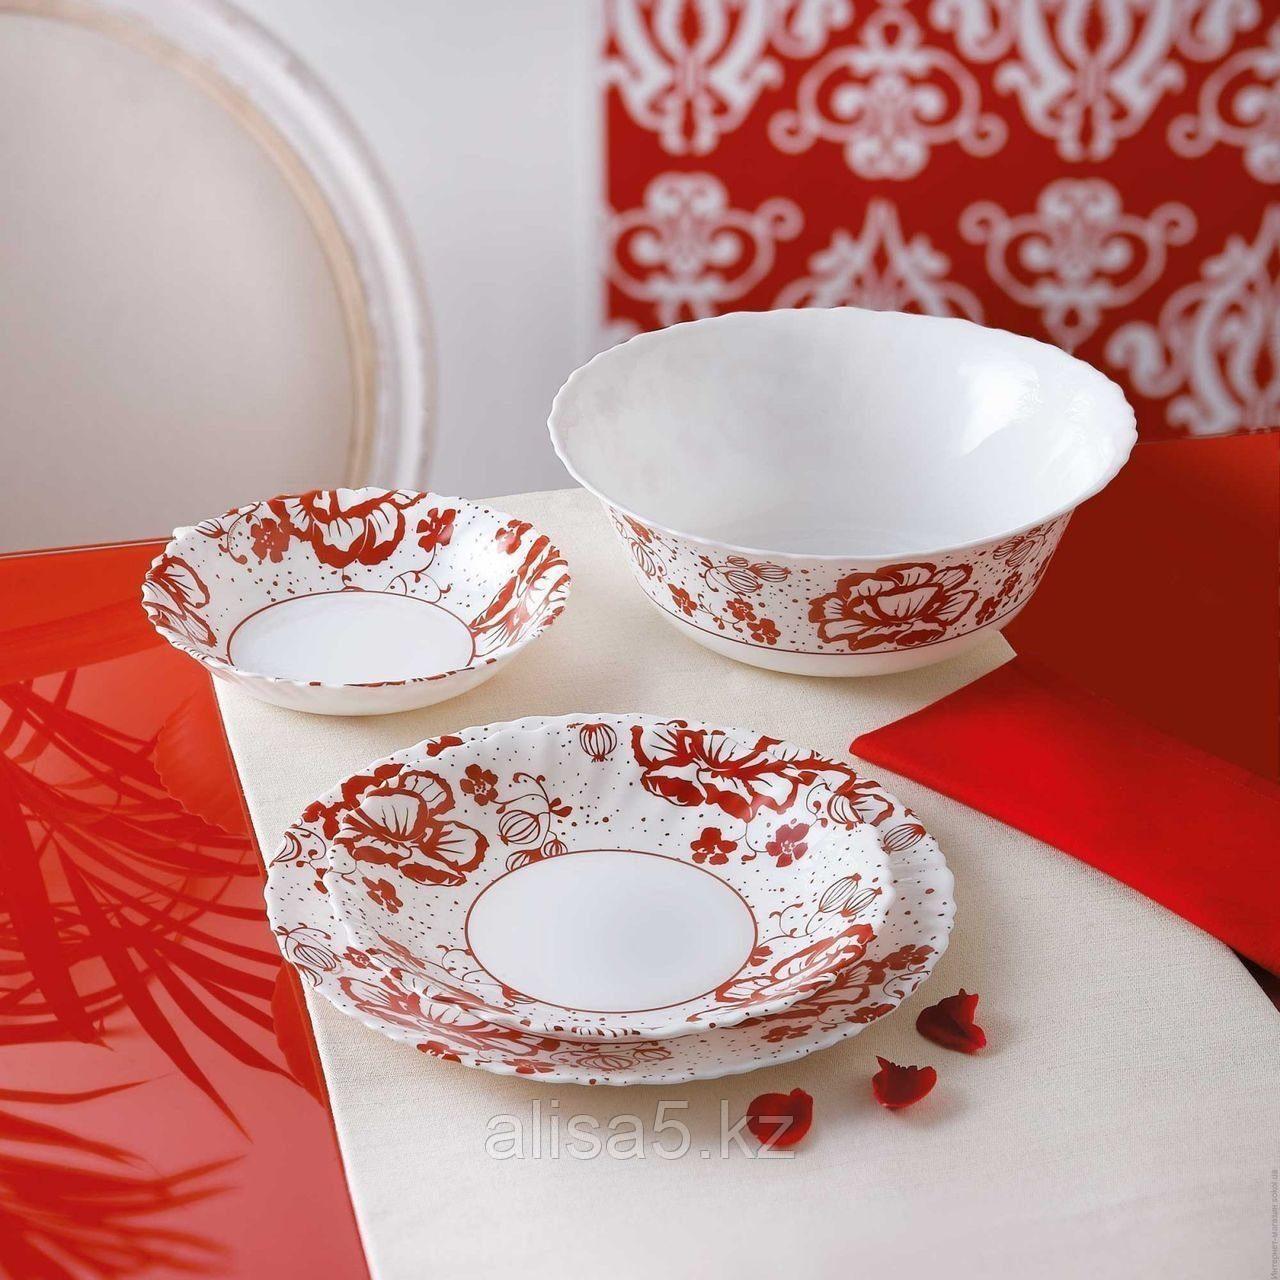 ROMANCIA RED столовый сервиз на 6 персон из 19 предметов, шт